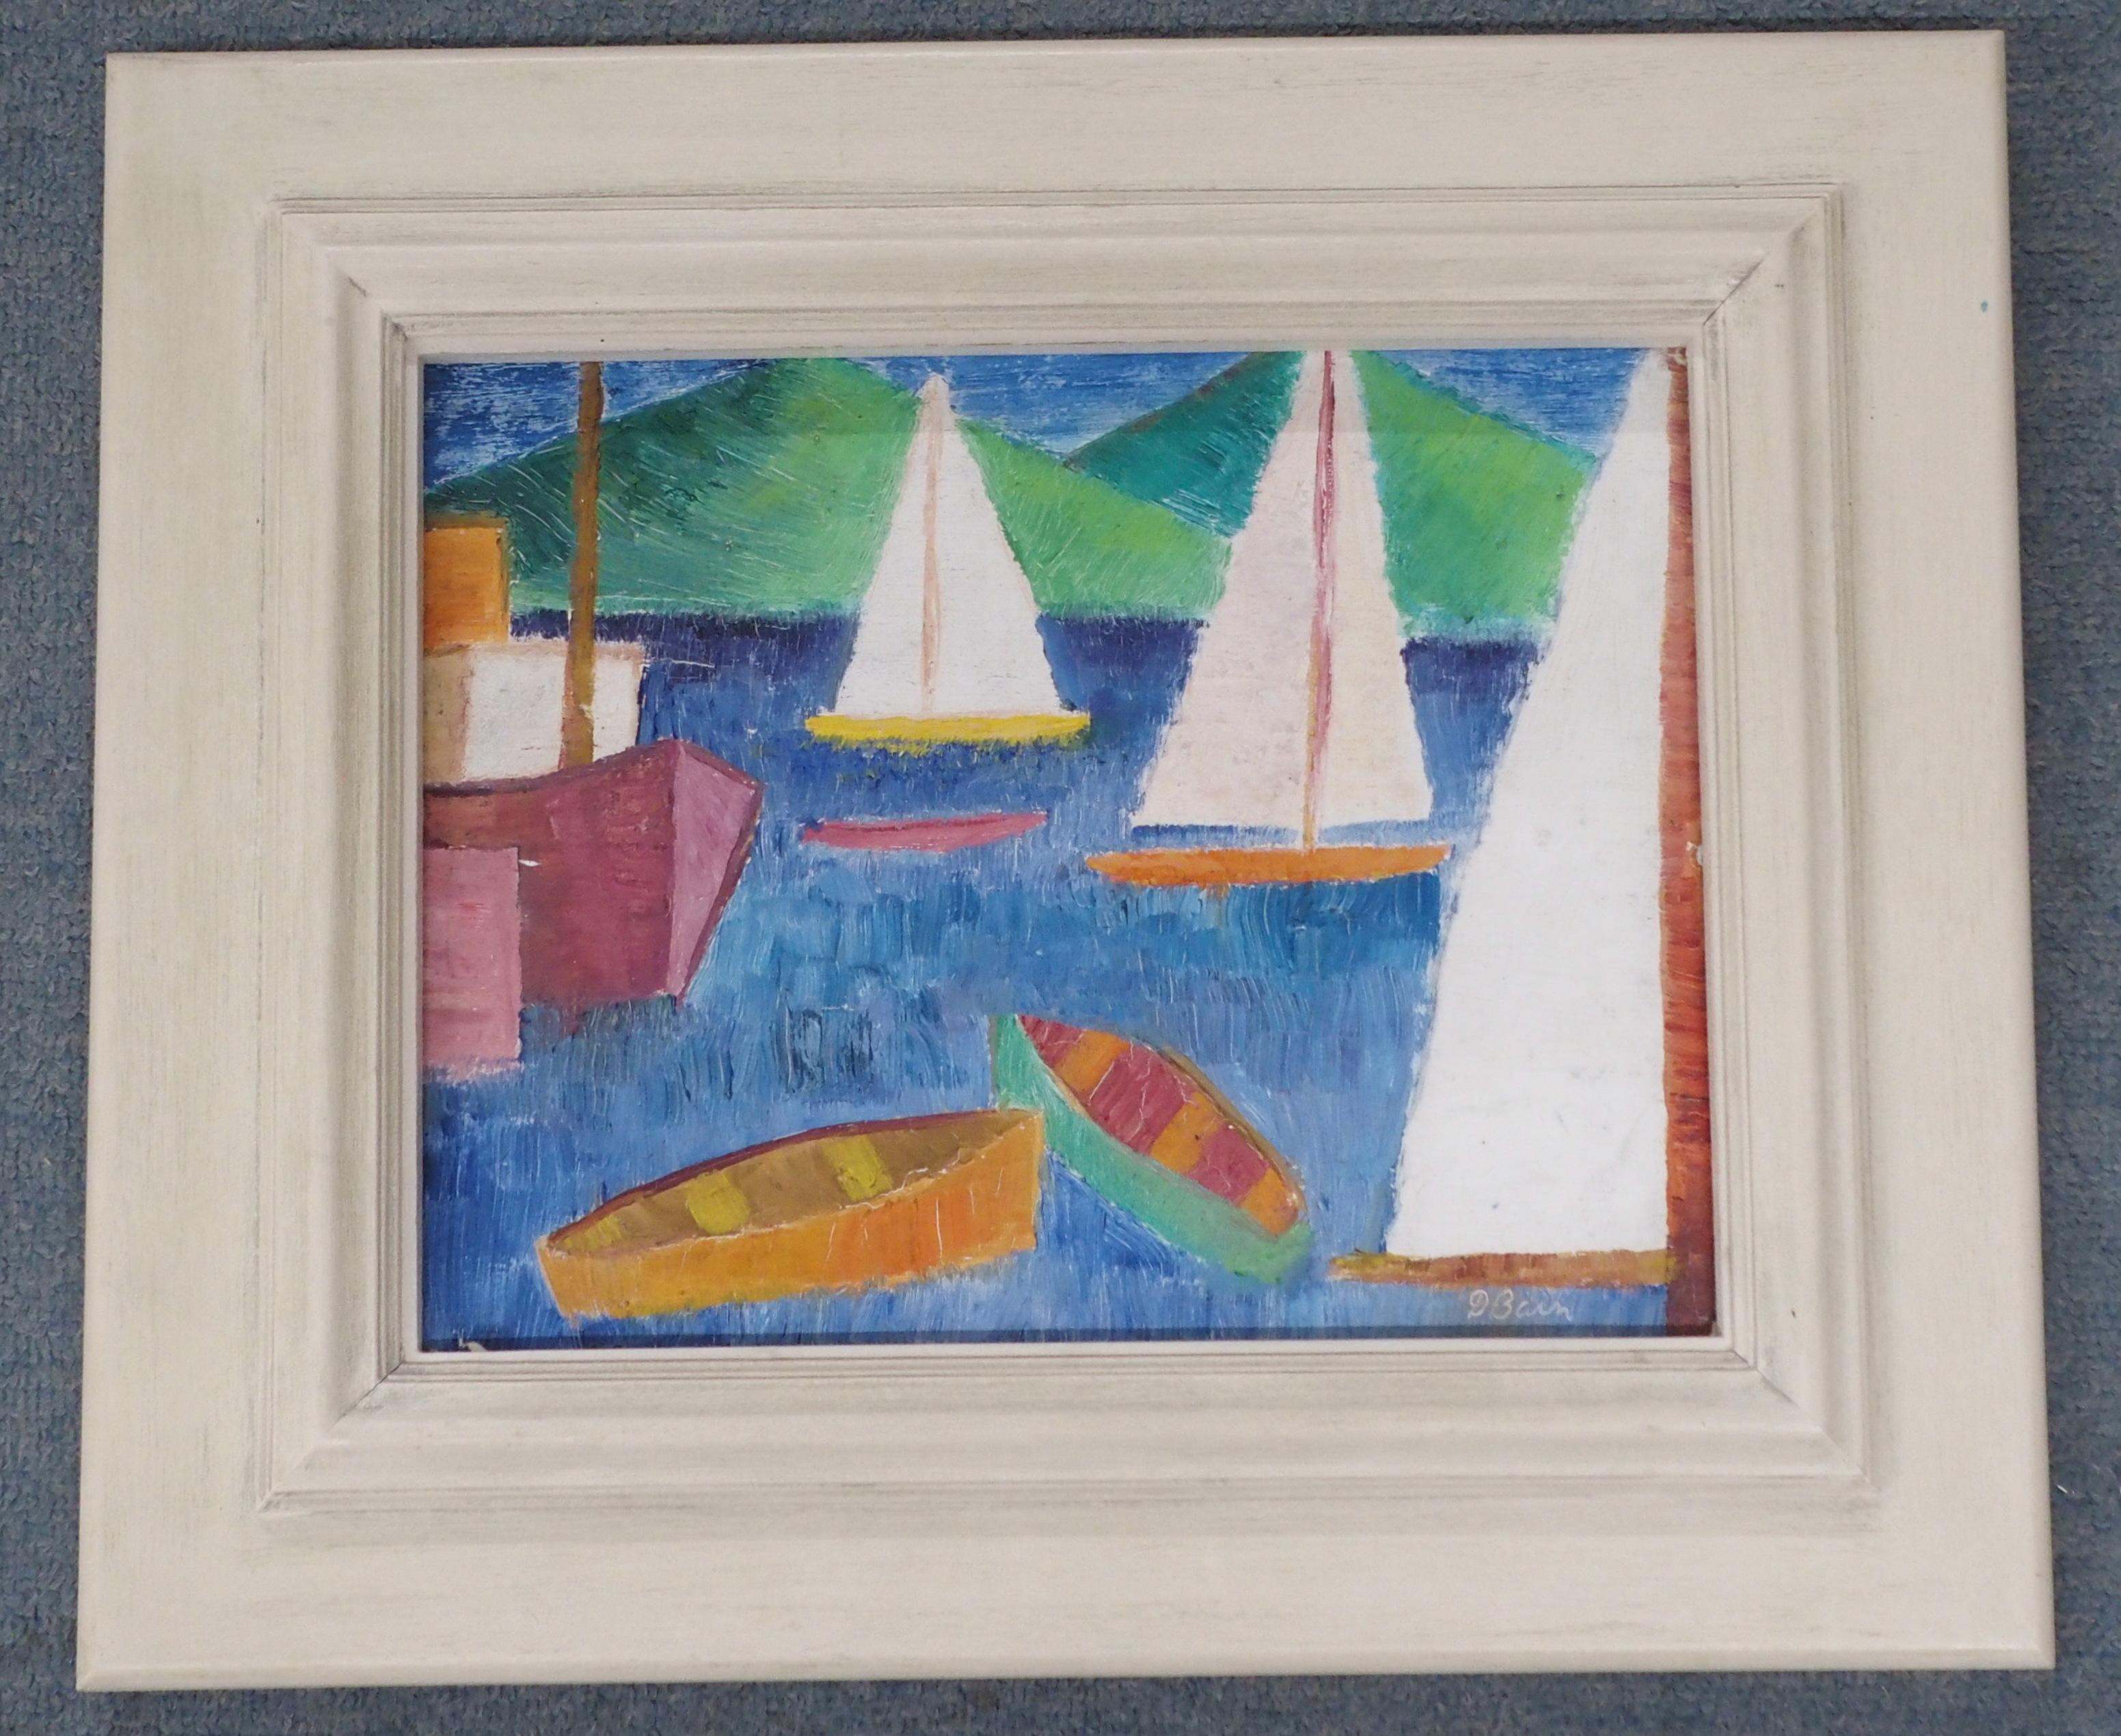 •DONALD BAIN (SCOTTISH 1904-1979) VACANCE DE MER oil on board, signed, 24 x 31cm William Hardie - Image 2 of 6